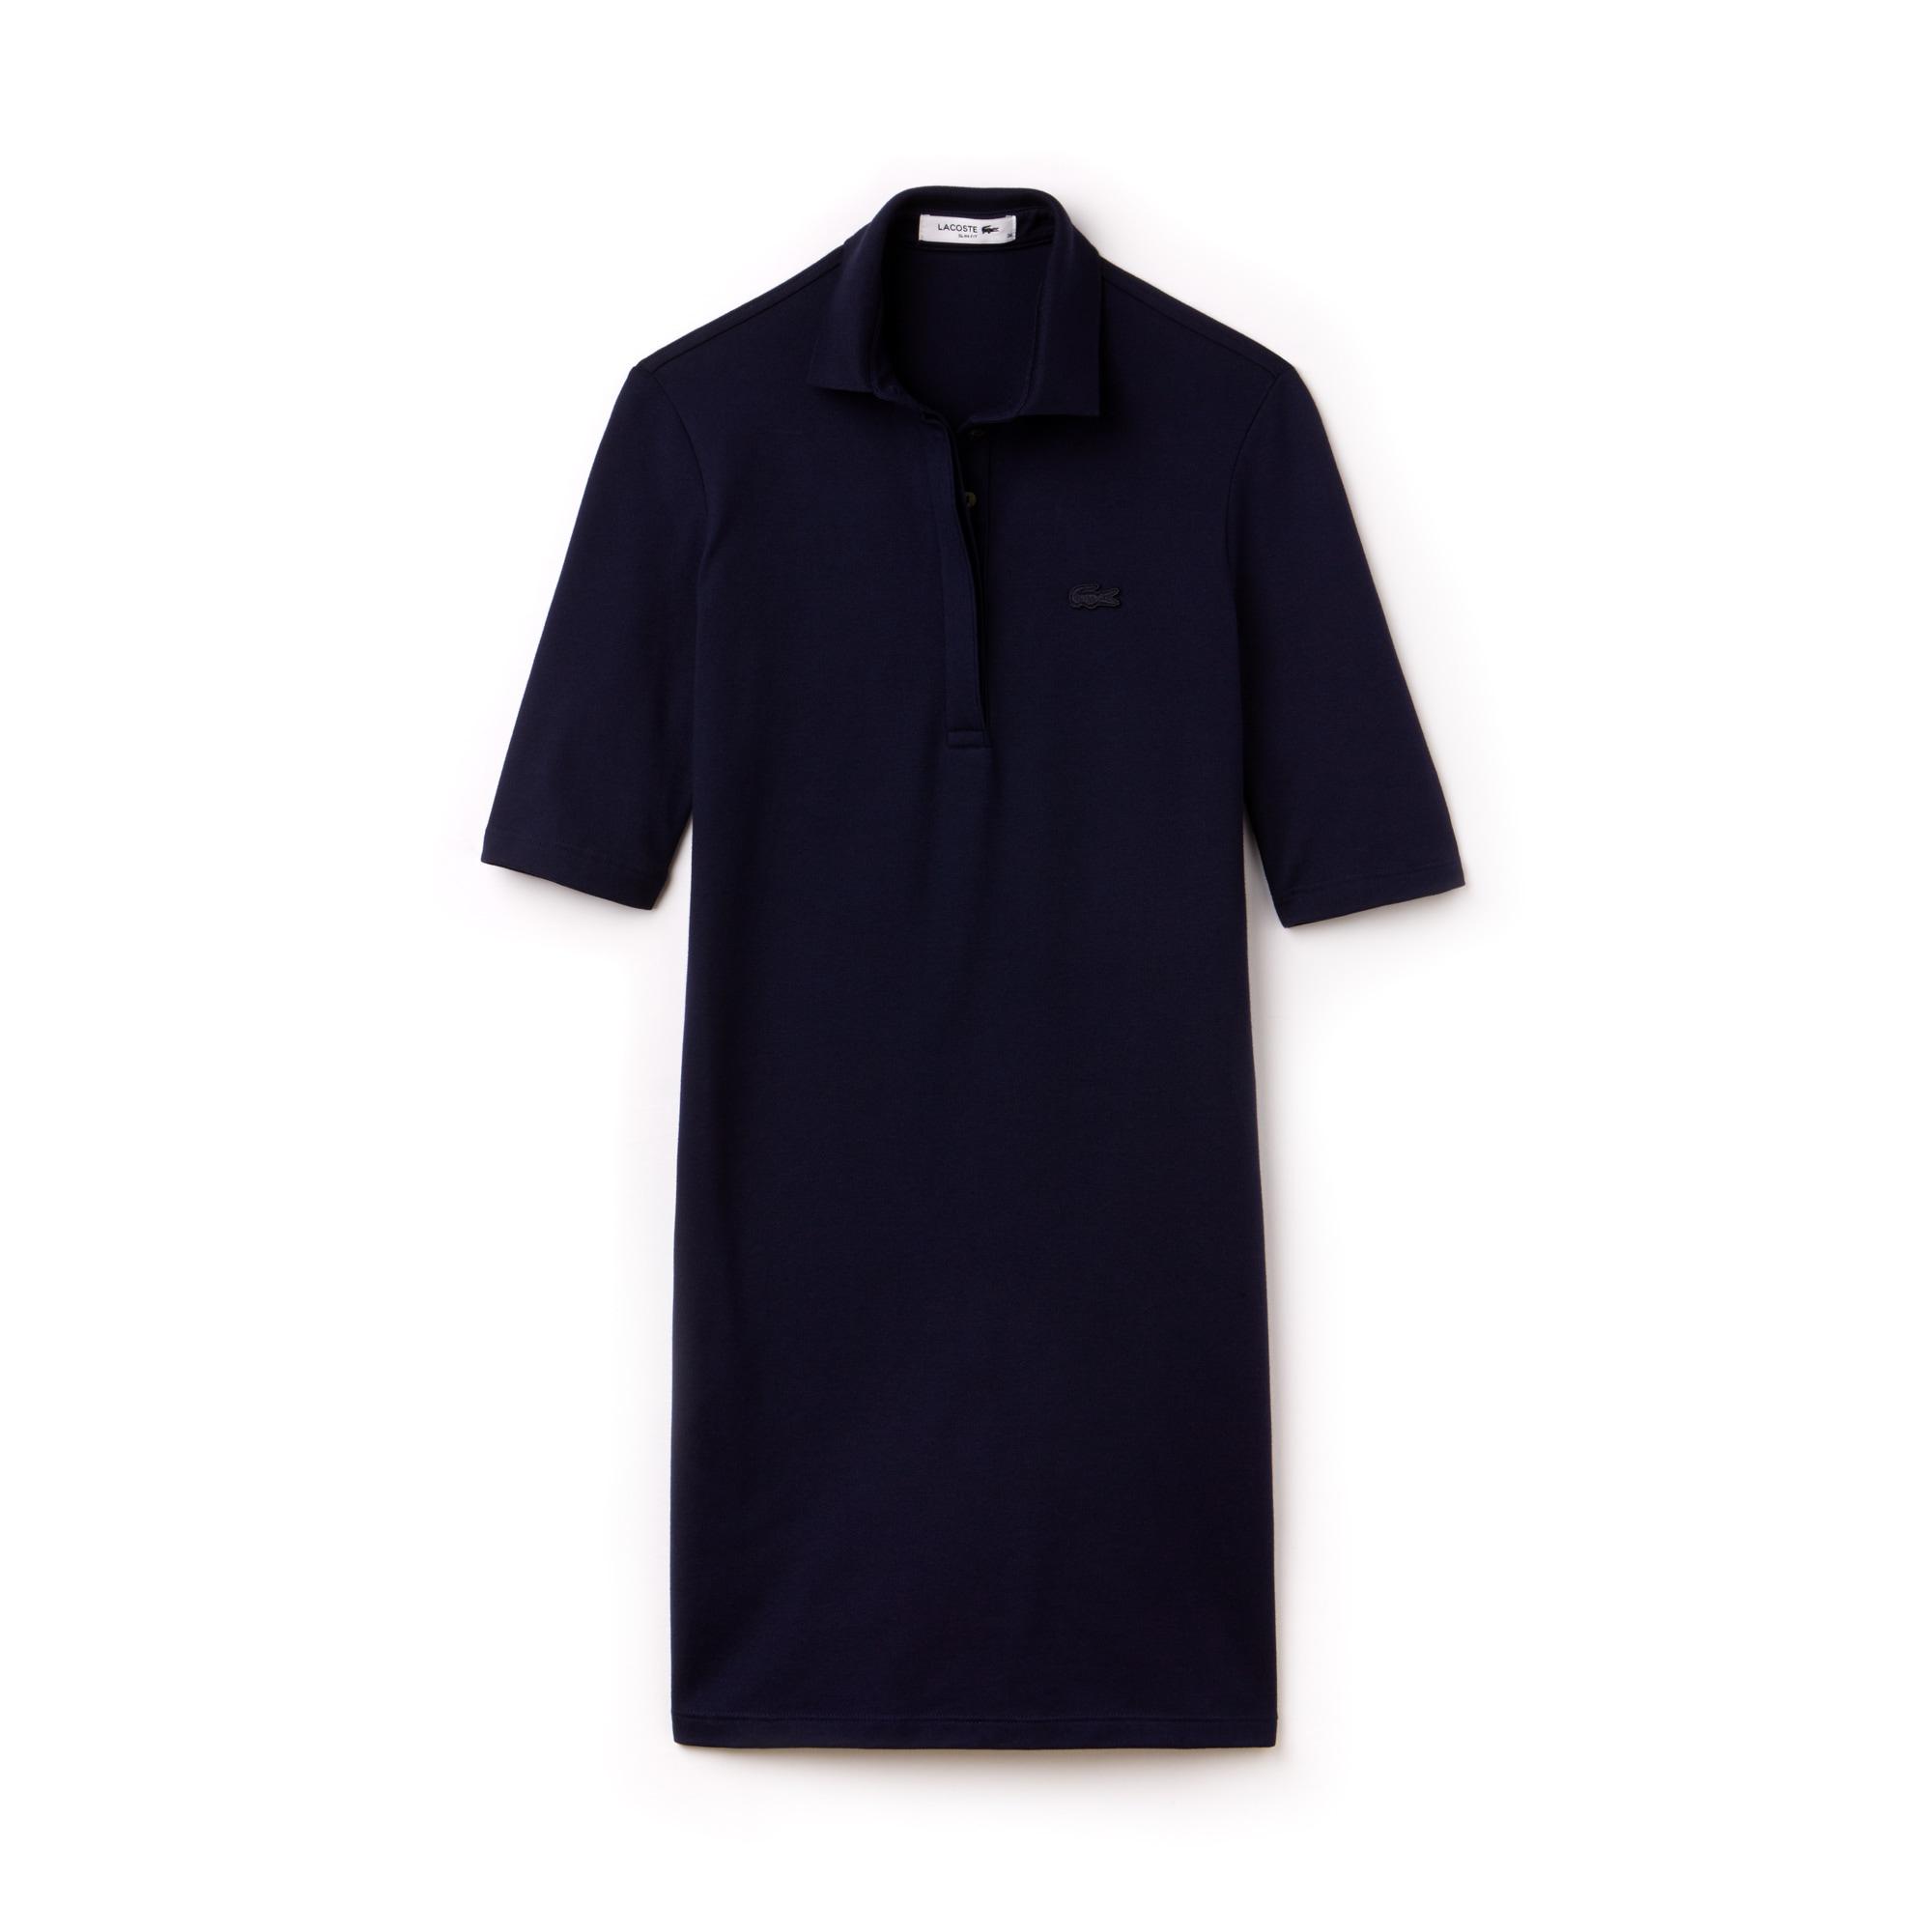 Piqué À Quart Mini Manches Fit Polo Slim Robe Stretch Trois En vynPw0OmN8